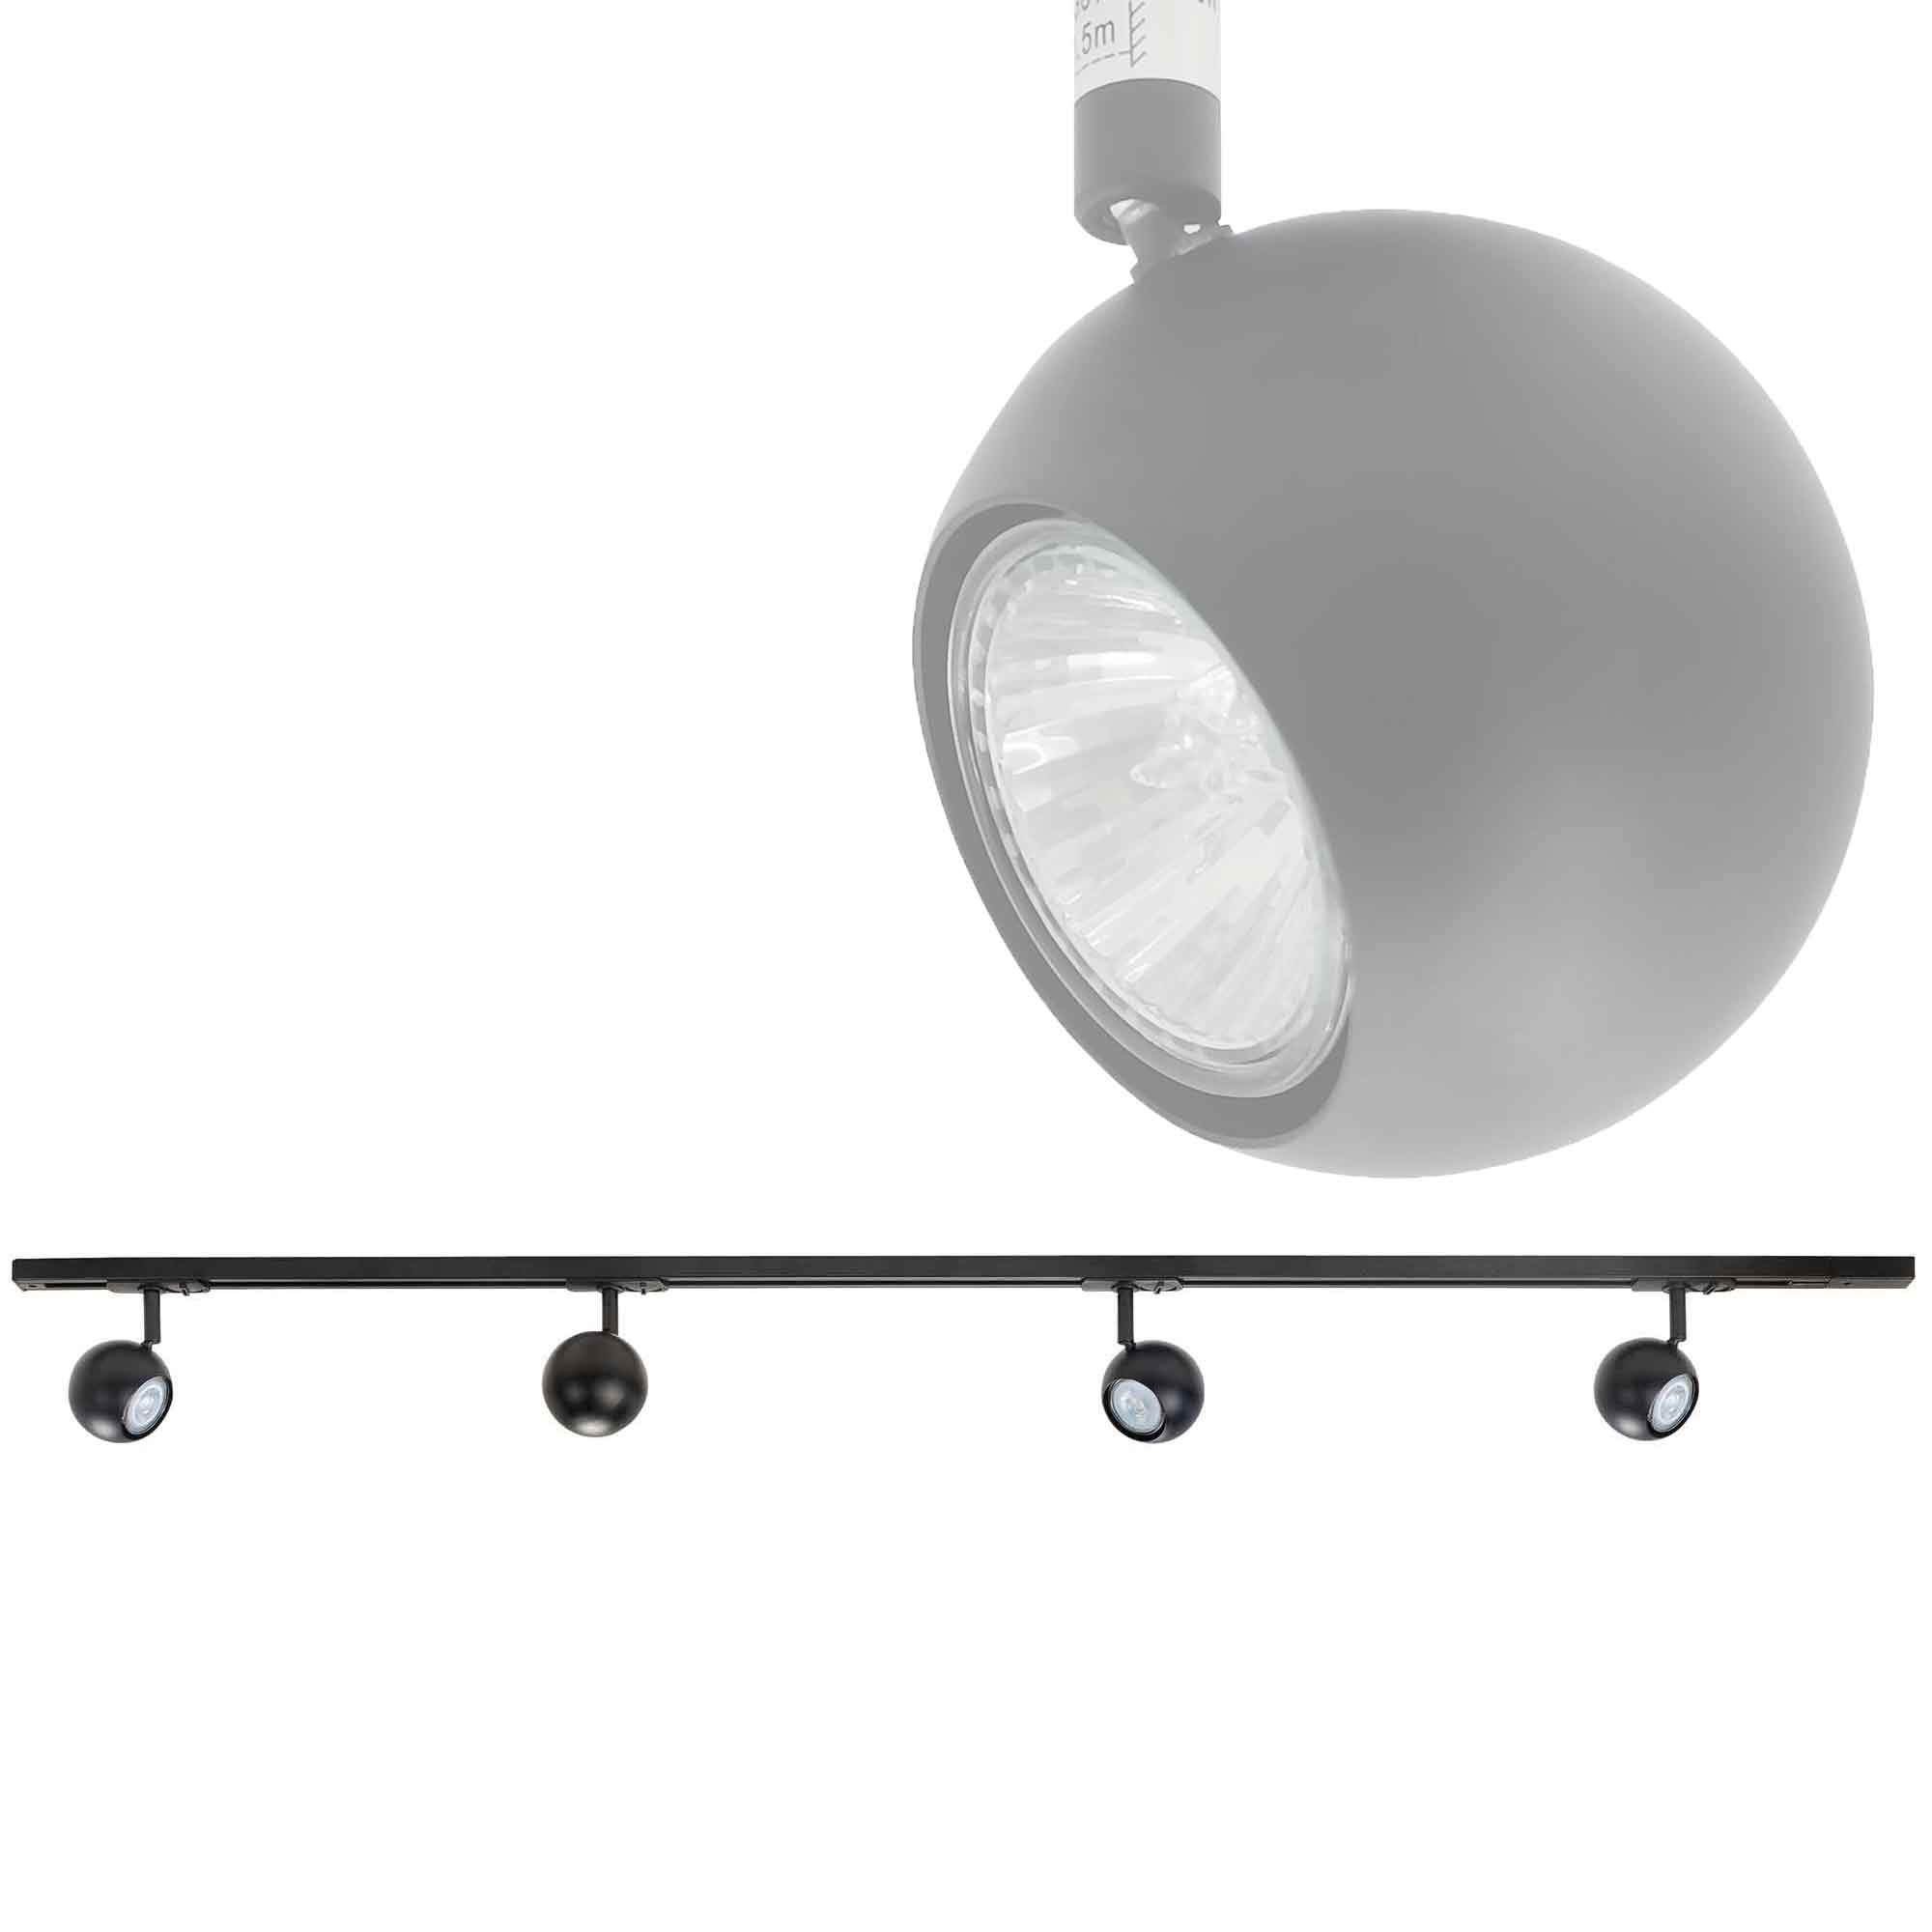 Highlight Railsysteem Trackline 150 cm + 4 retrobol spots zwart